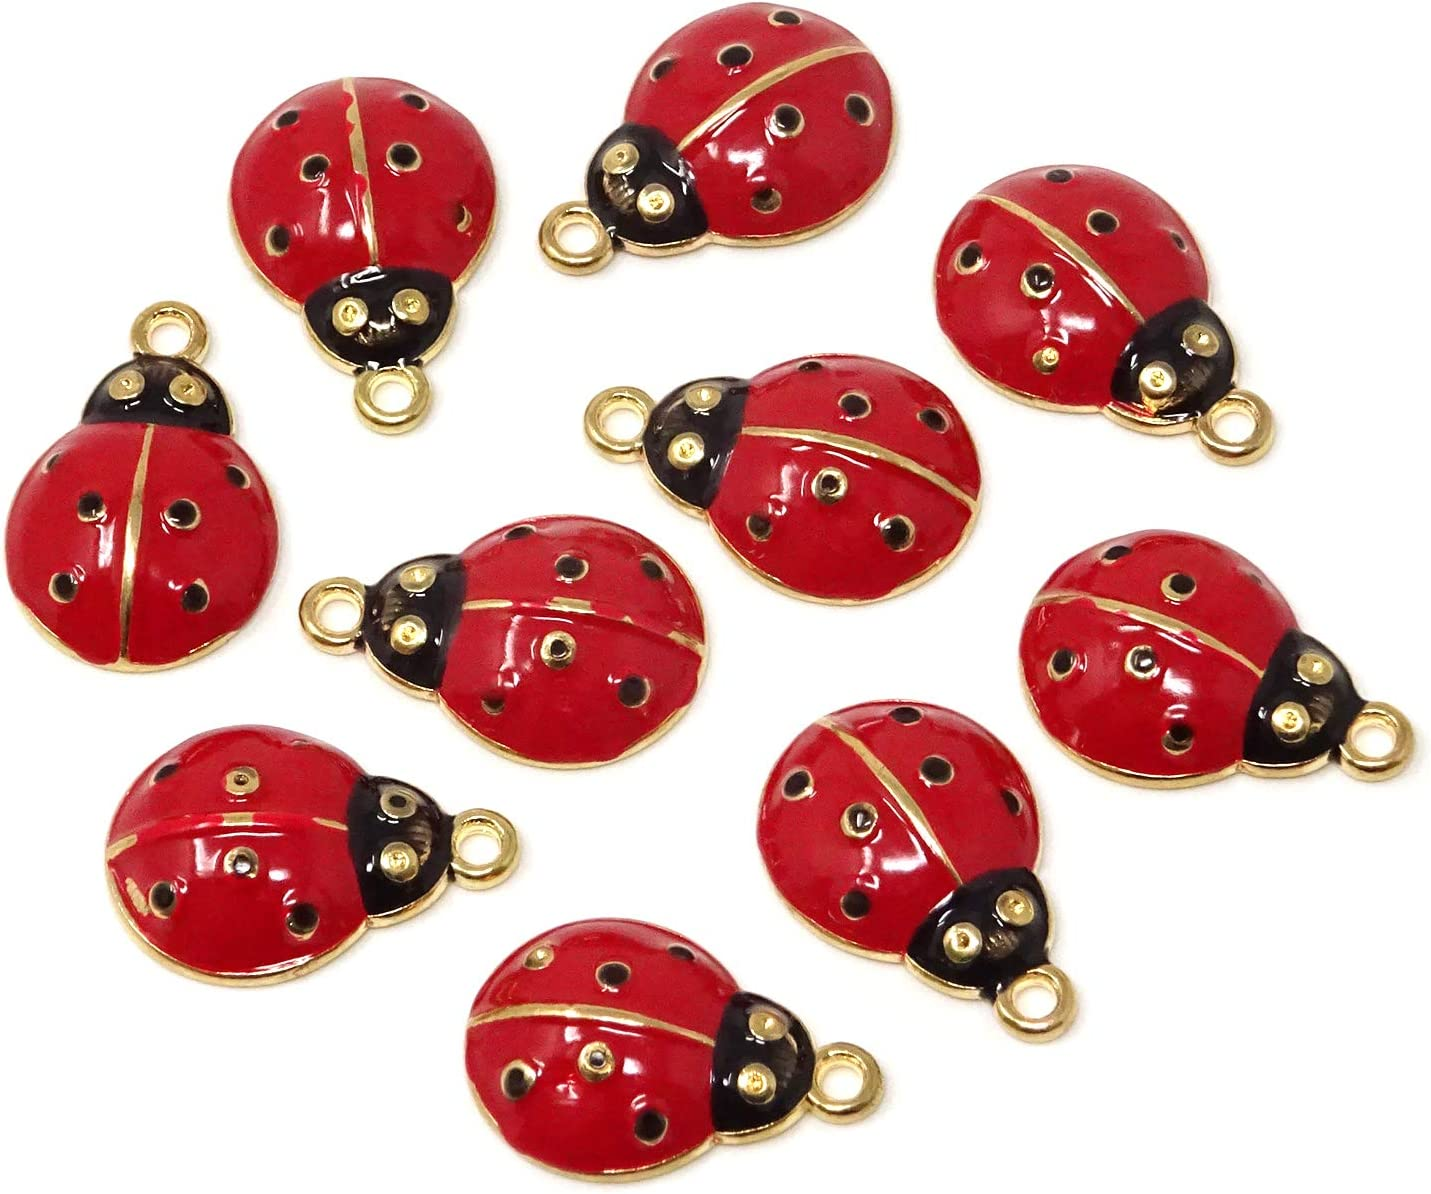 10Pcs//Set Enamel Alloy Cat Charms Pendant Jewelry Finding DIY Craft Making YJUS